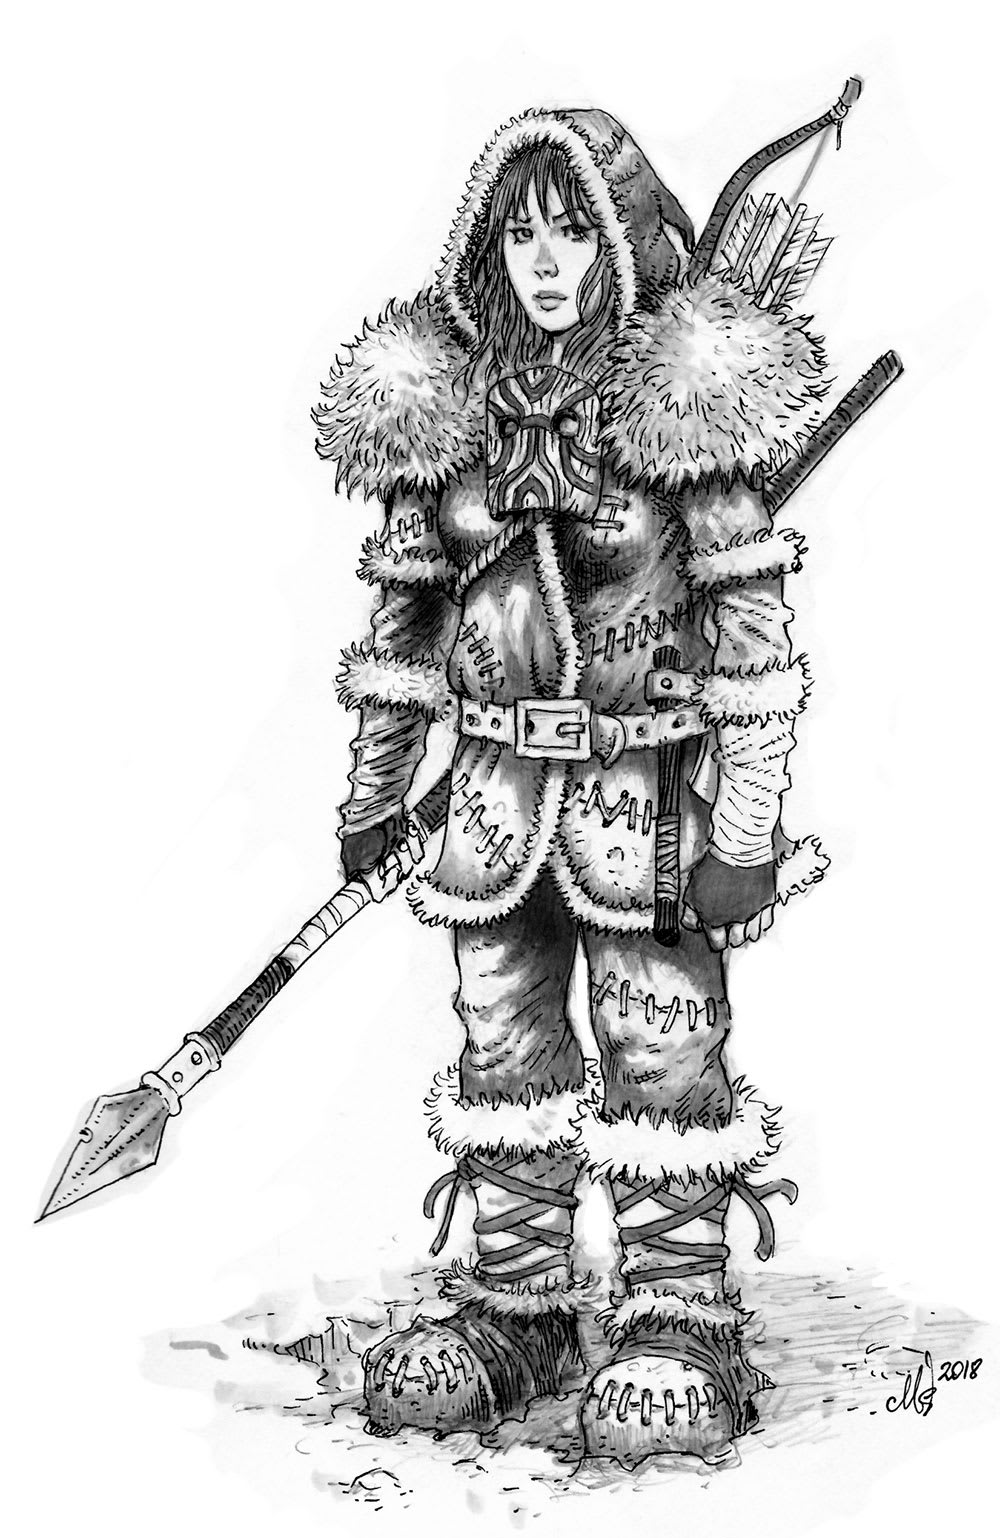 Alaise, Man Arctic Strider